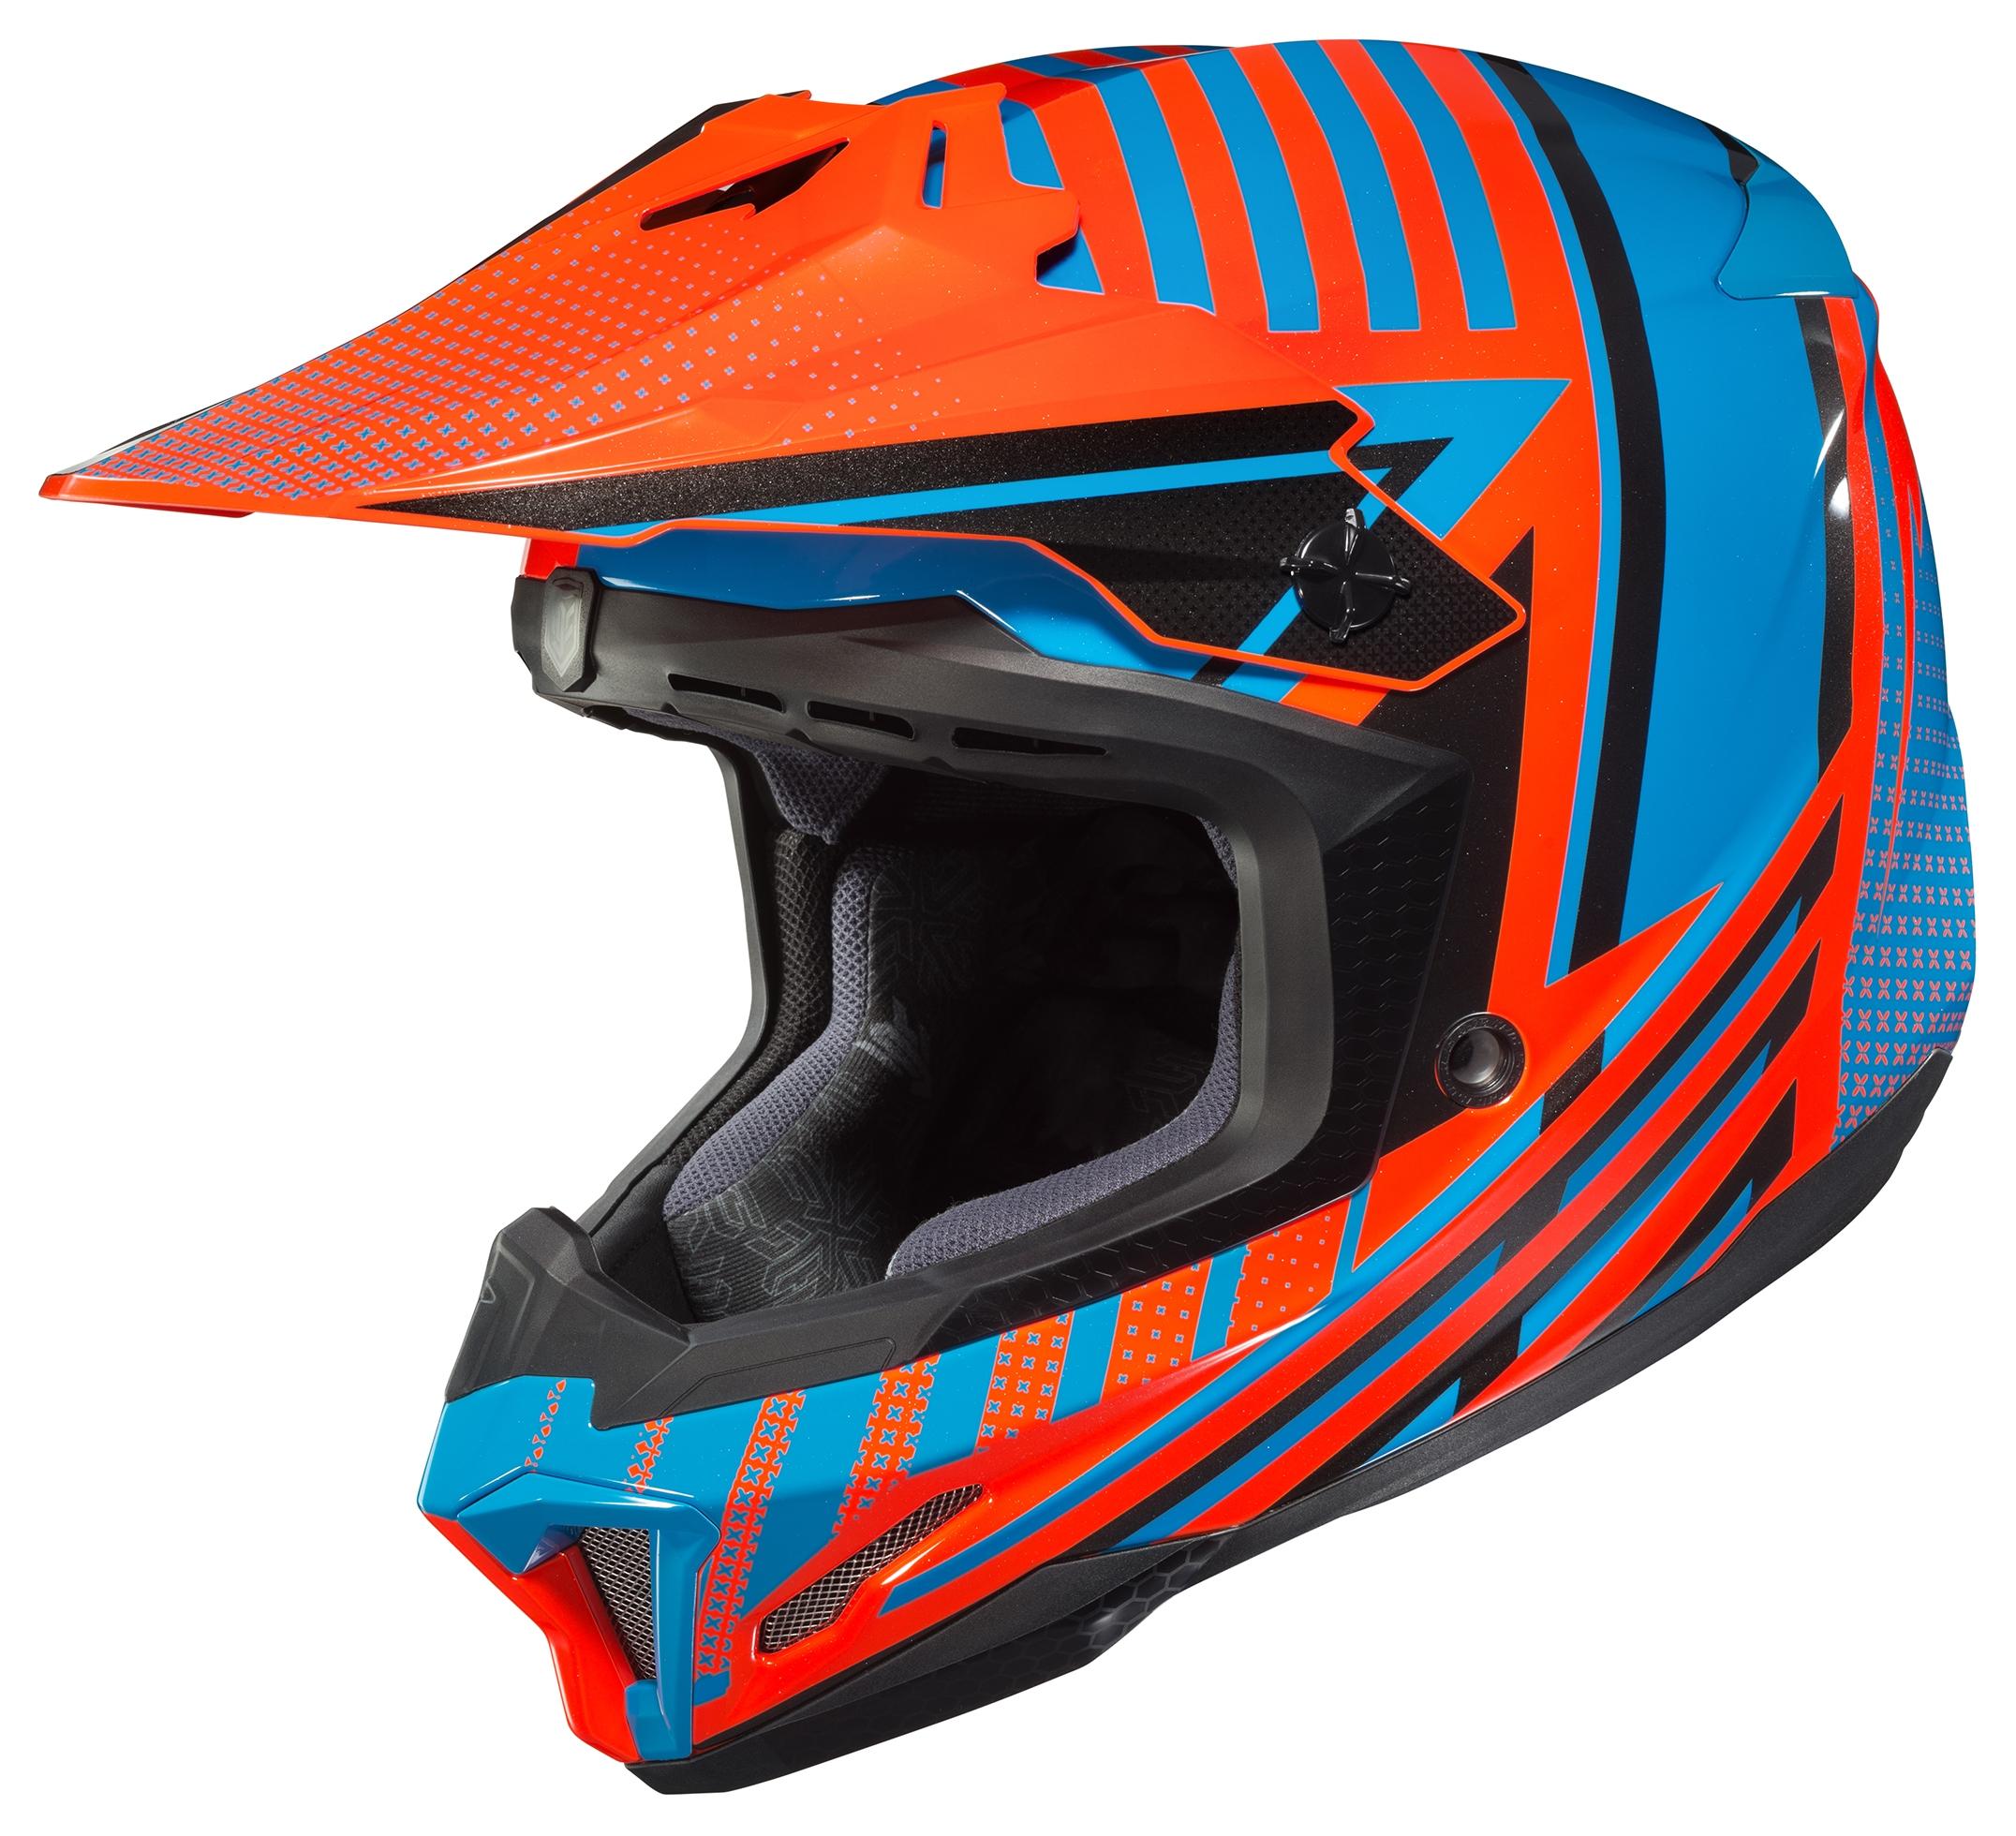 Vcan® Milano Scooter Helmet - 156004, Helmets & Goggles at